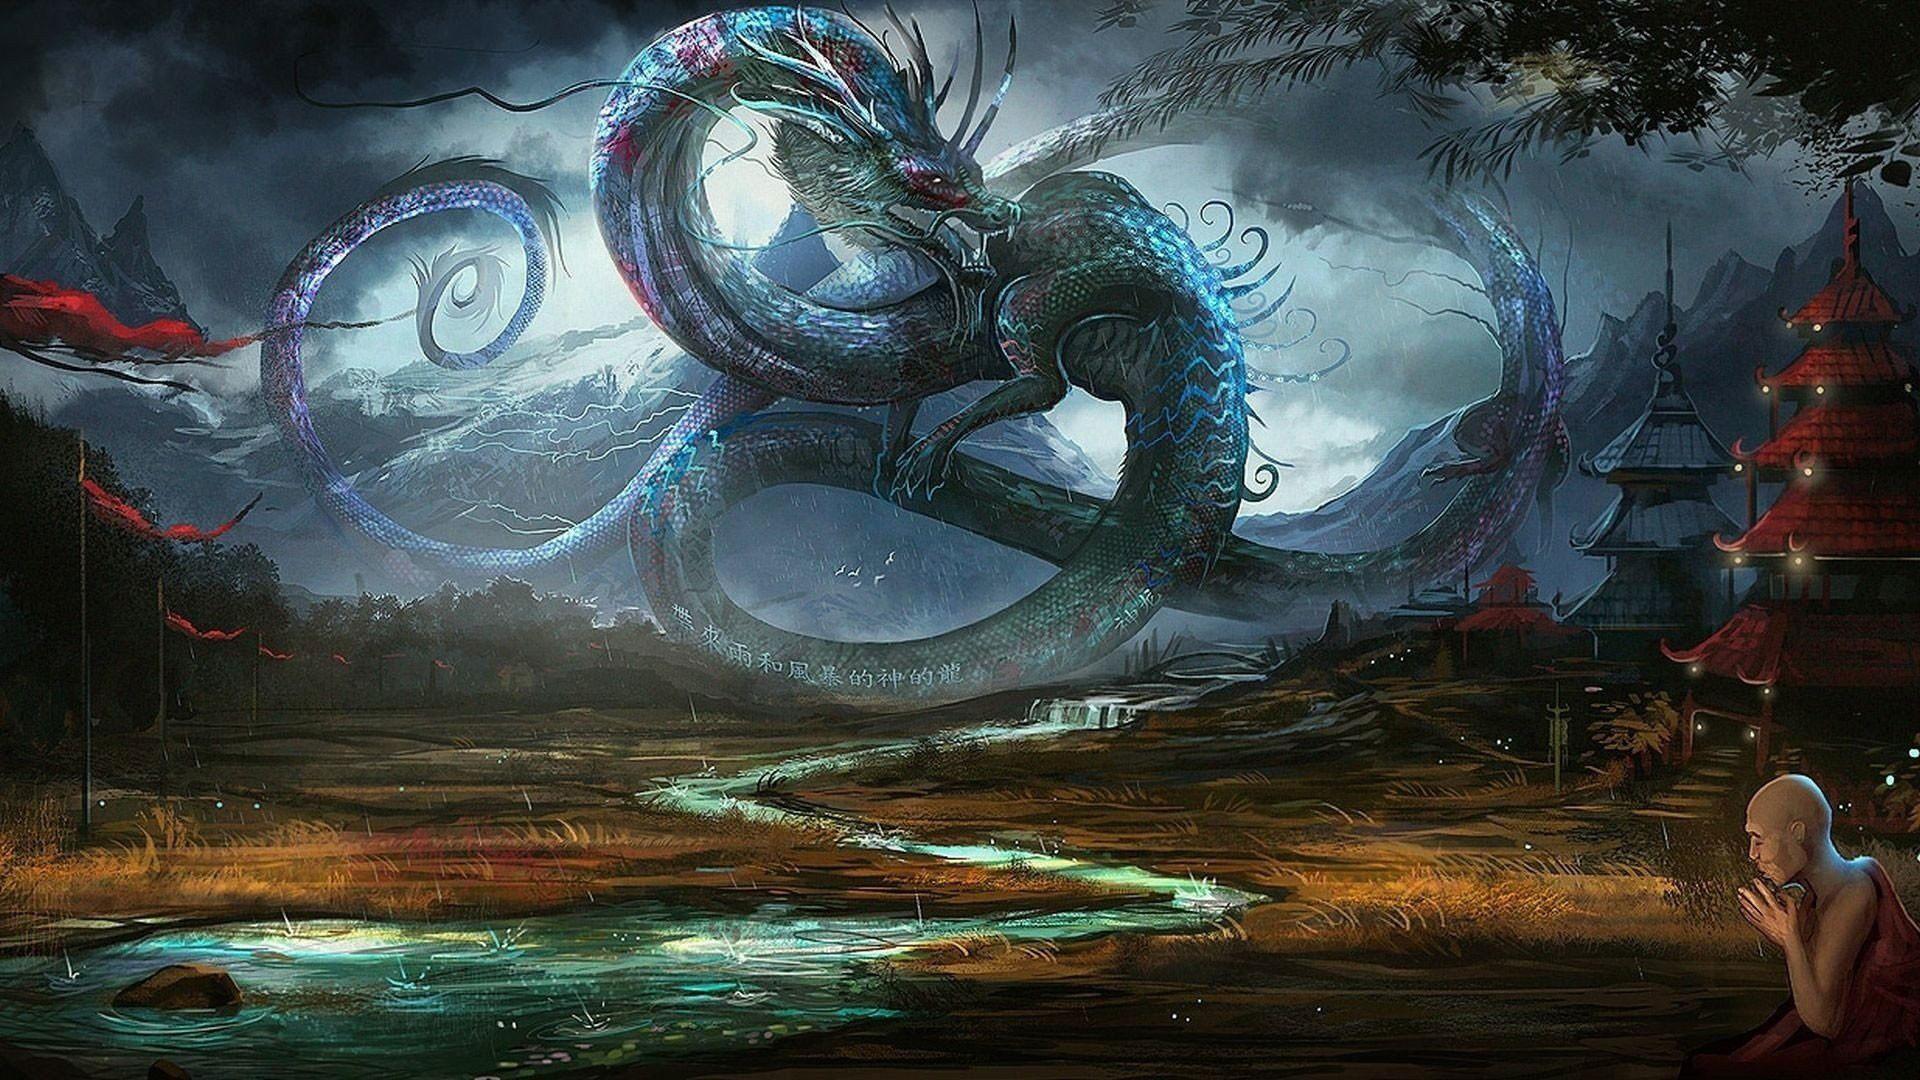 Fantasy dragon wallpaper desktop